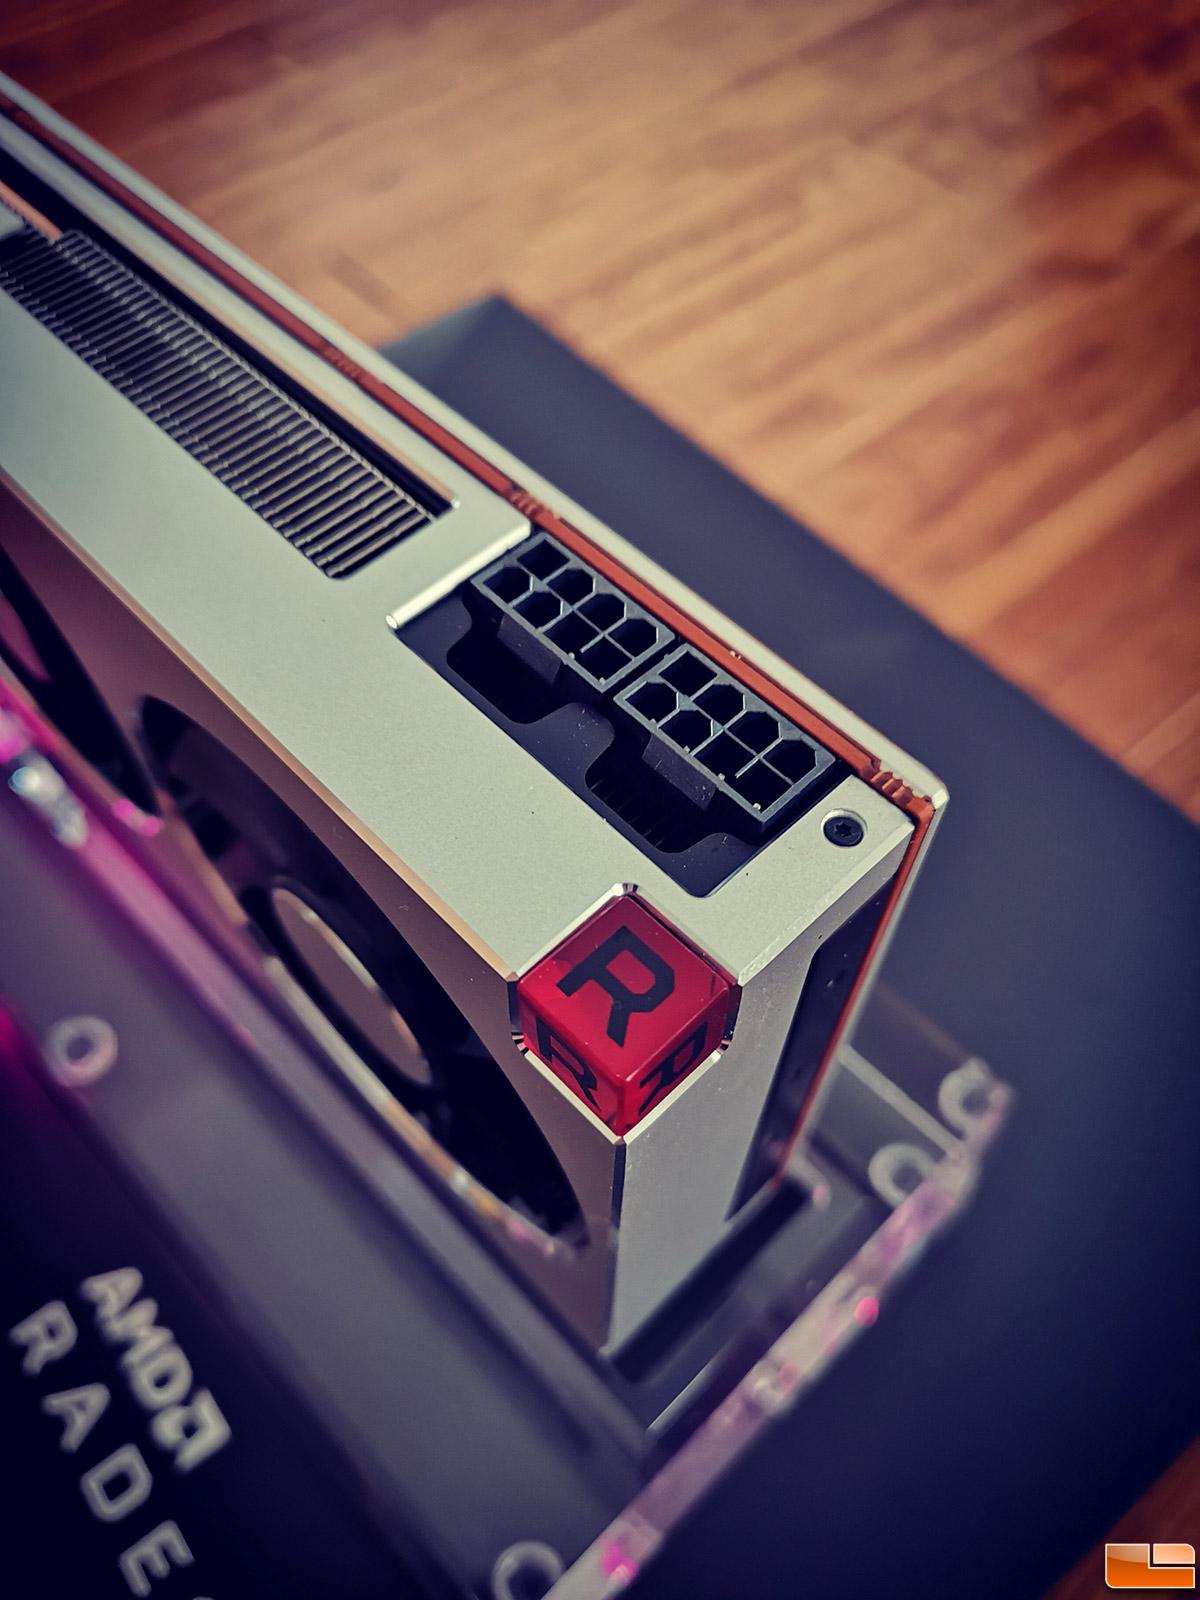 AMD Radeon VII 16GB Graphics Card Unboxed - Legit Reviews